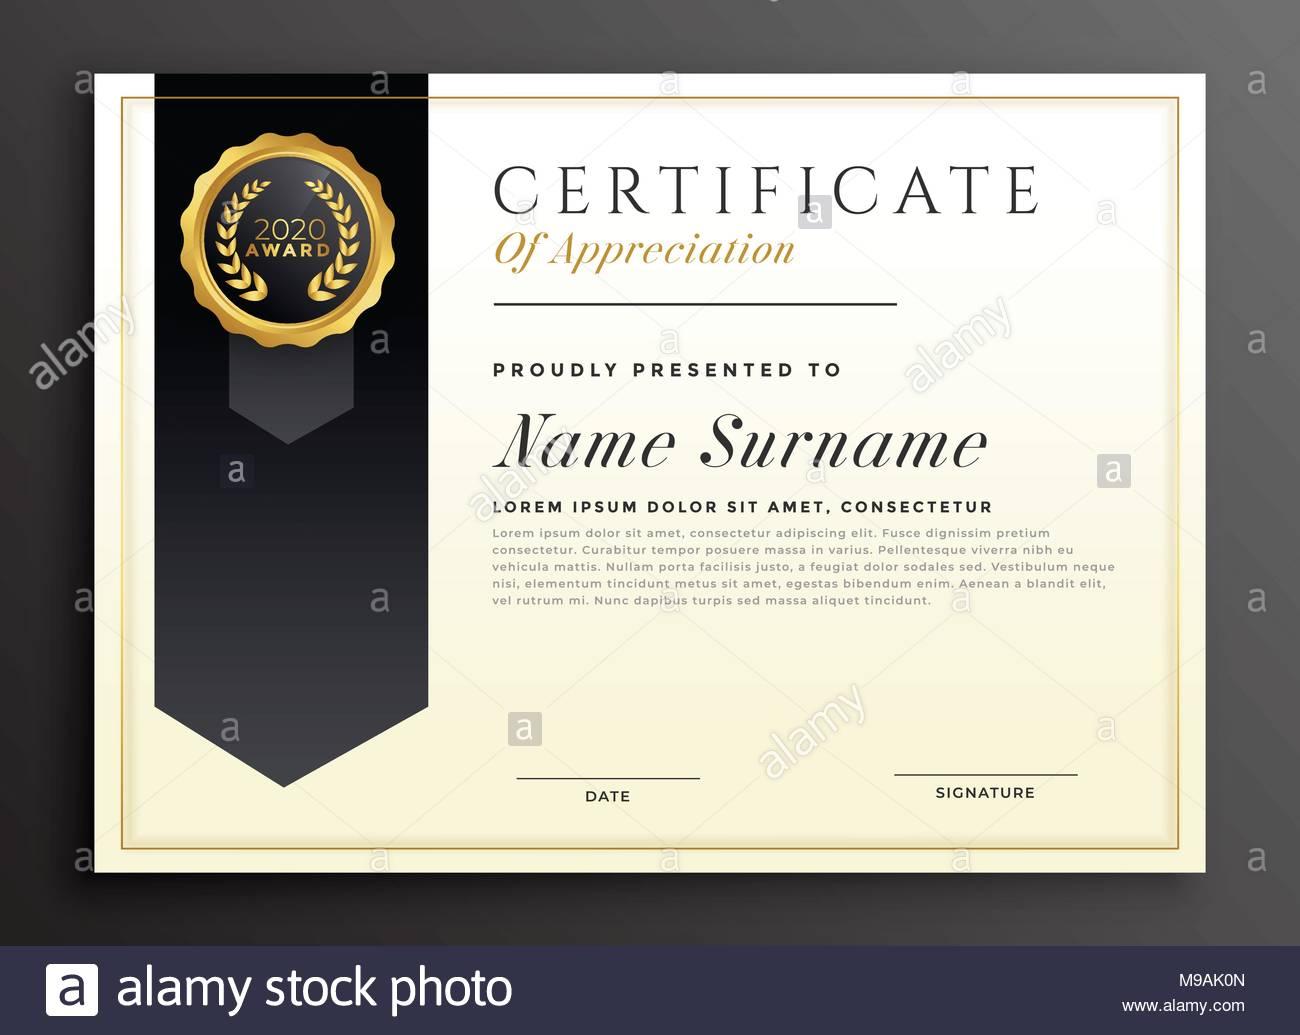 Charmant Elegante Zertifikatvorlage Fotos - Entry Level Resume ...